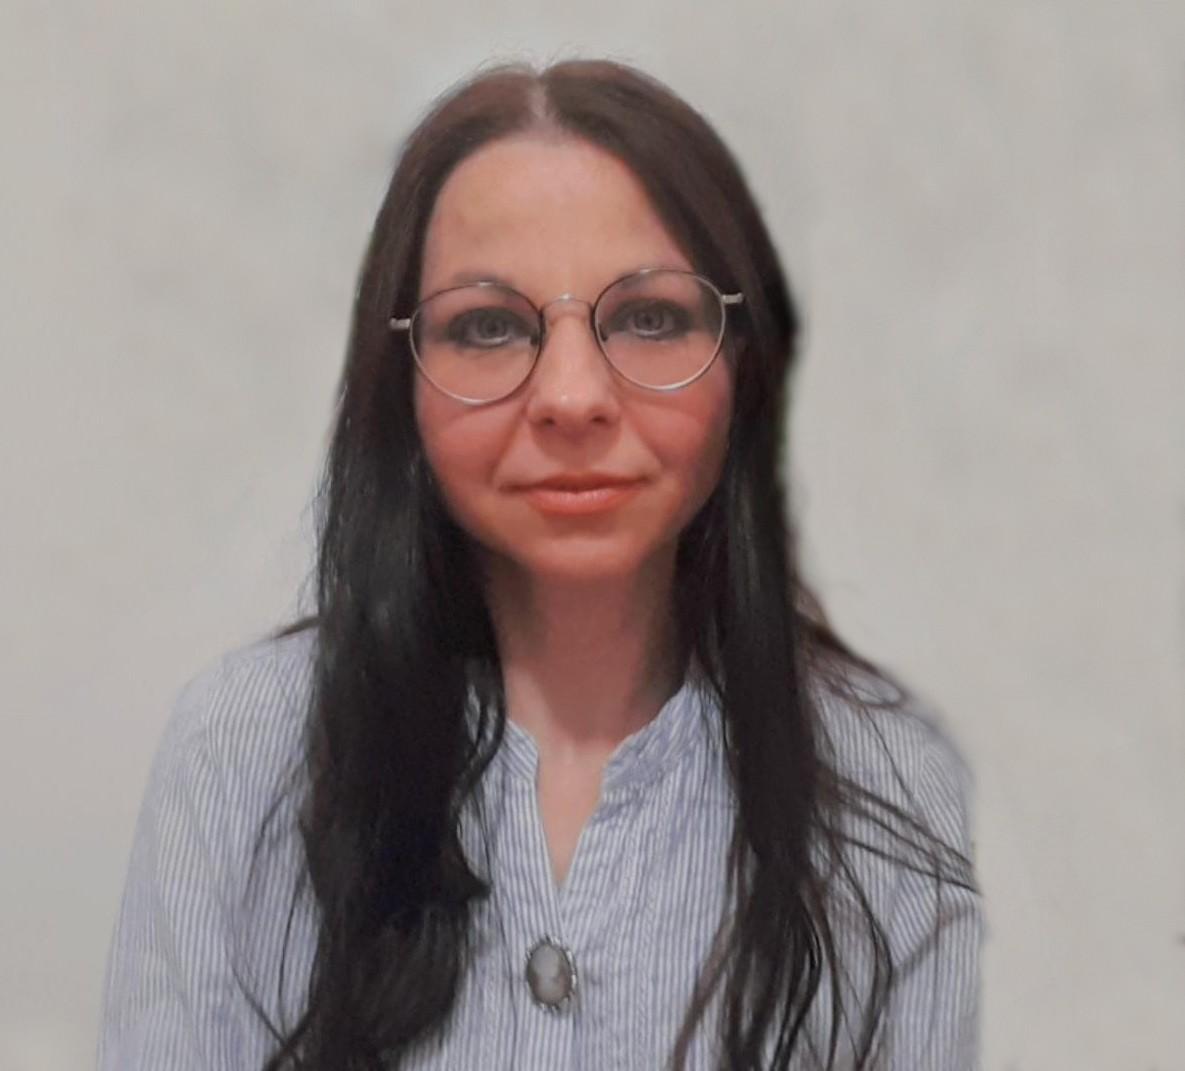 Raluca Liliana Anghelache